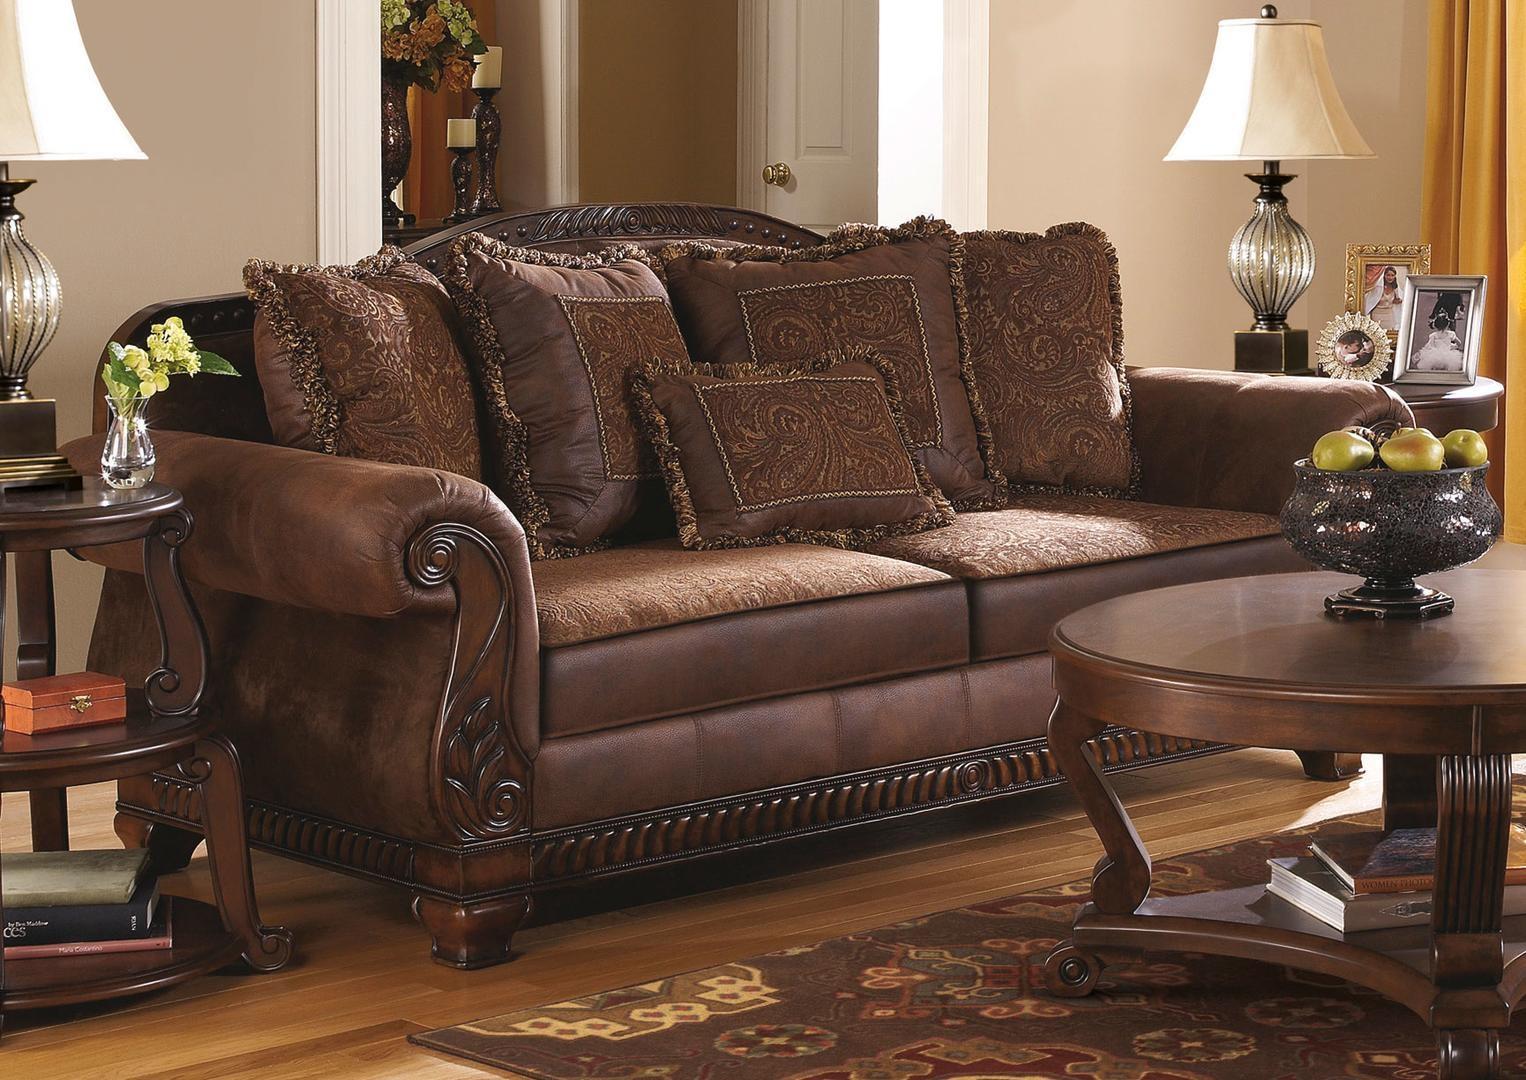 Ashley 1540038 Bradington Series Stationary Fabric Sofa Inside Bradington Truffle Sofas (Image 1 of 20)